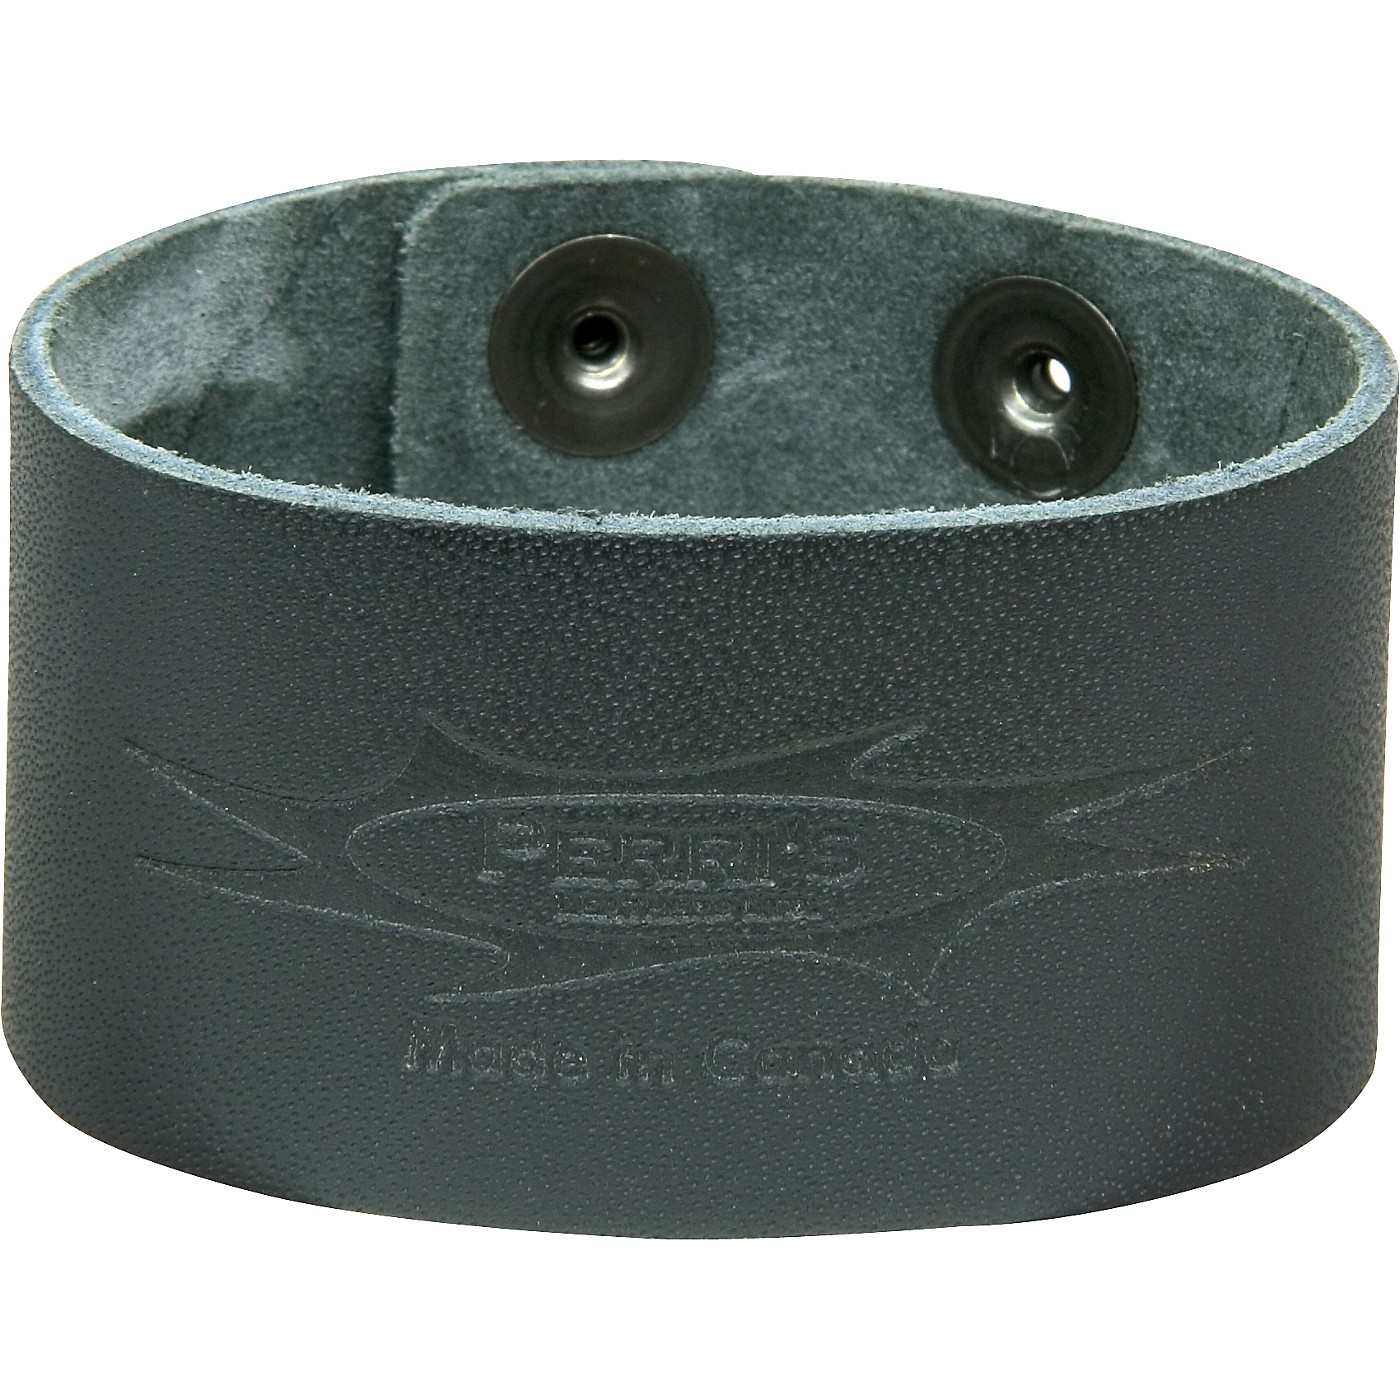 Perri's Leather Bracelet with Perri's Logo thumbnail